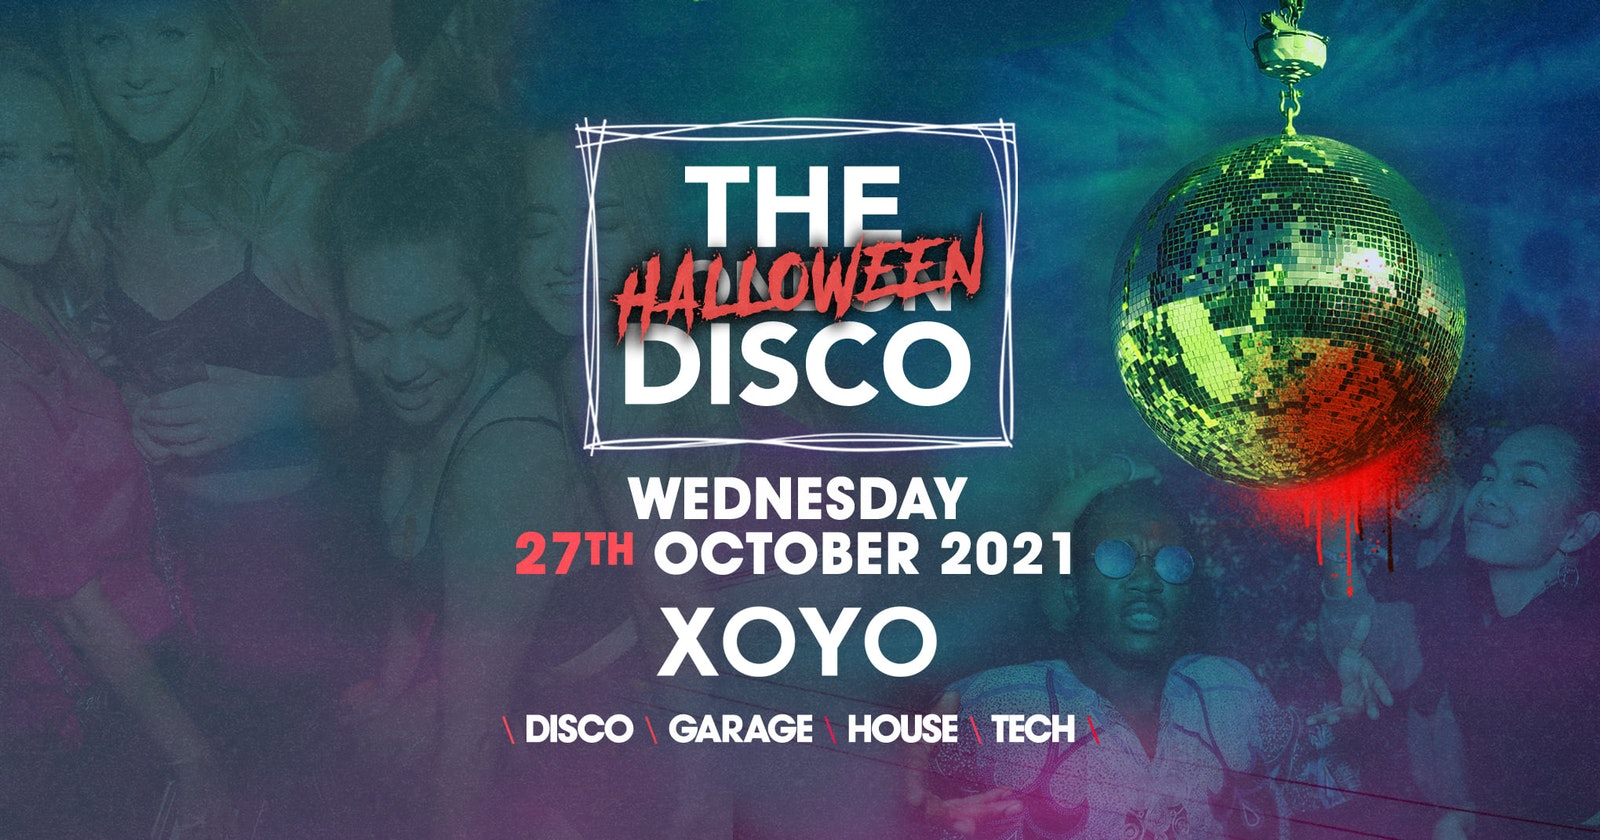 The London Halloween Disco 👽 House x Techno x Disco x Garage | XOYO